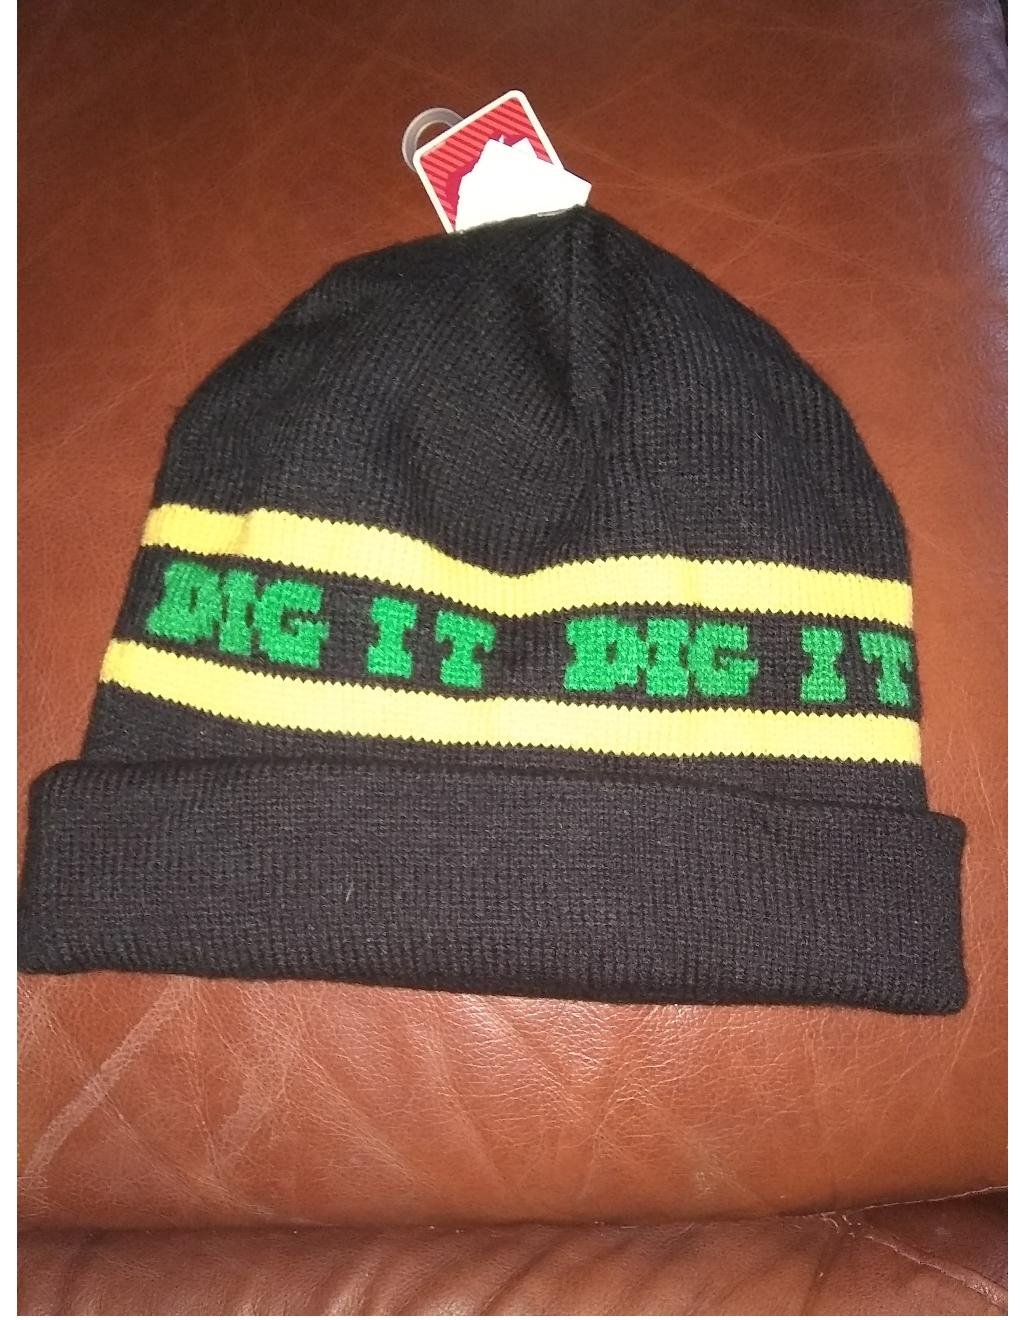 Old Navy Brand Stocking Hat Cap Mens Womens Boys Girls Teens OSFA Gift